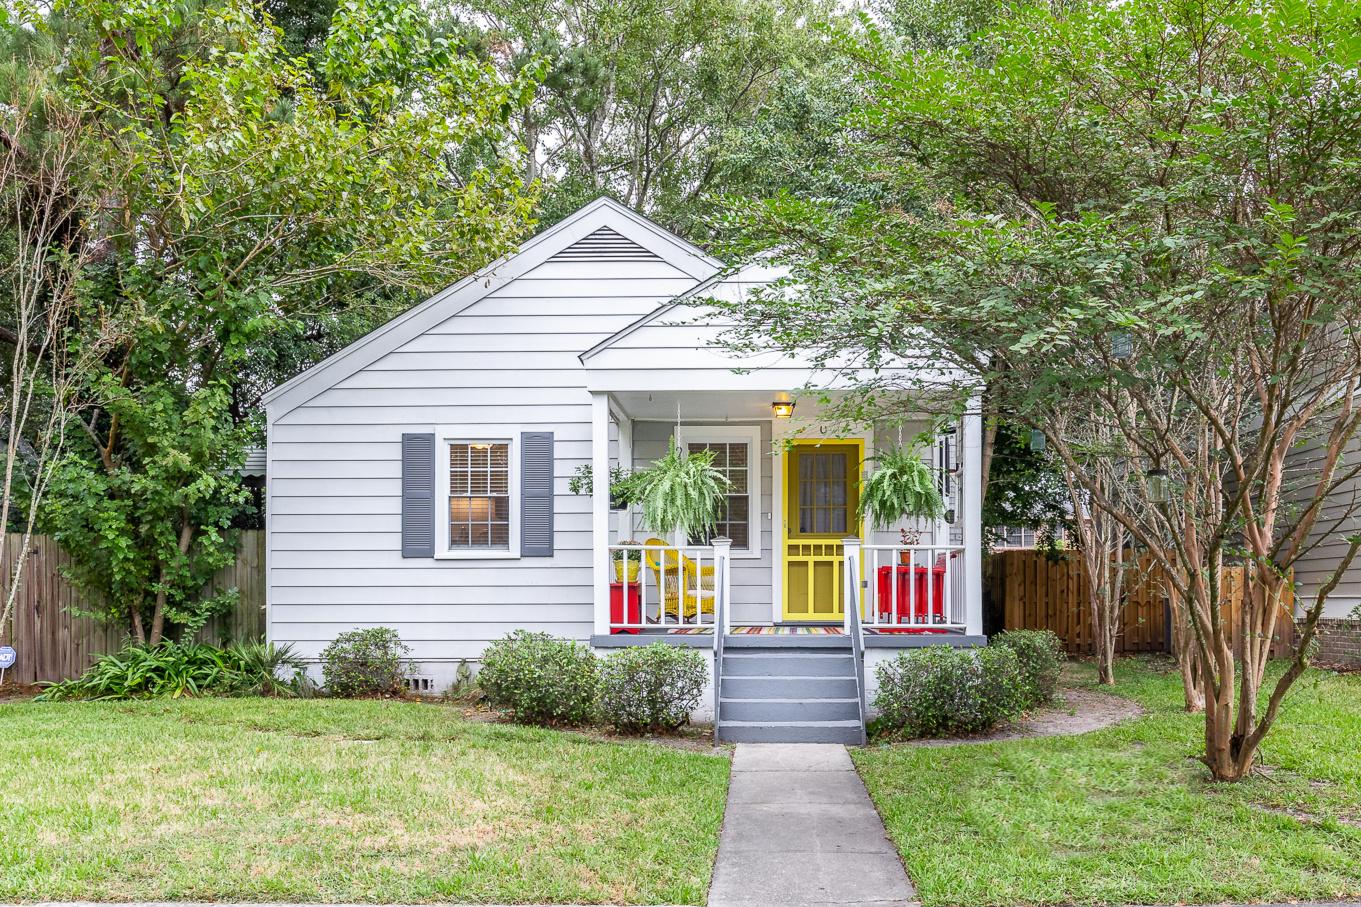 138 East 56th Street, Savannah, GA 31405